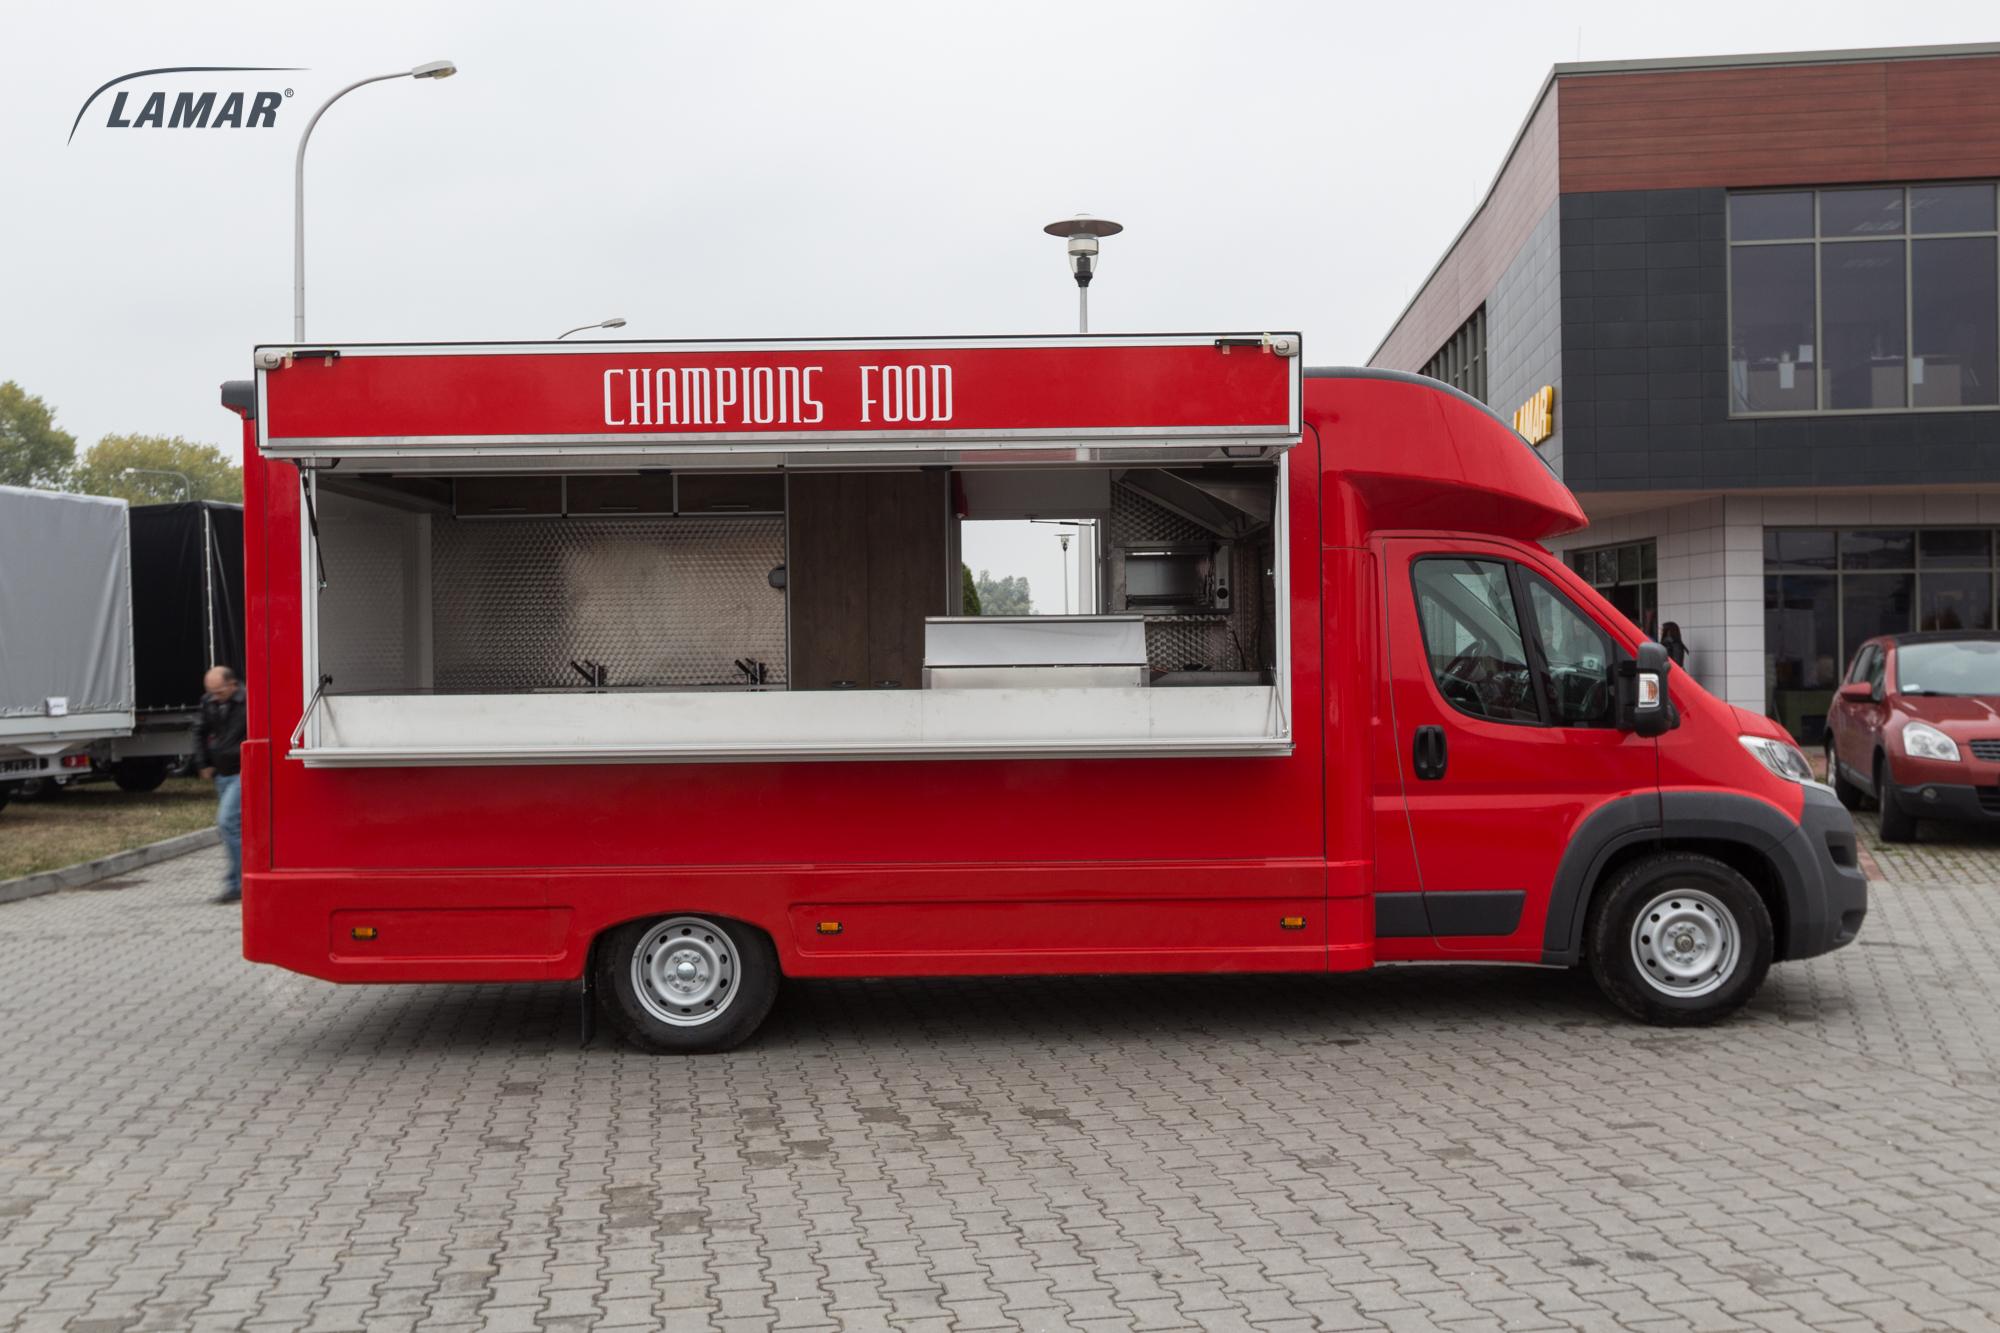 Fiat Ducato Lambox Food Truck Lamar